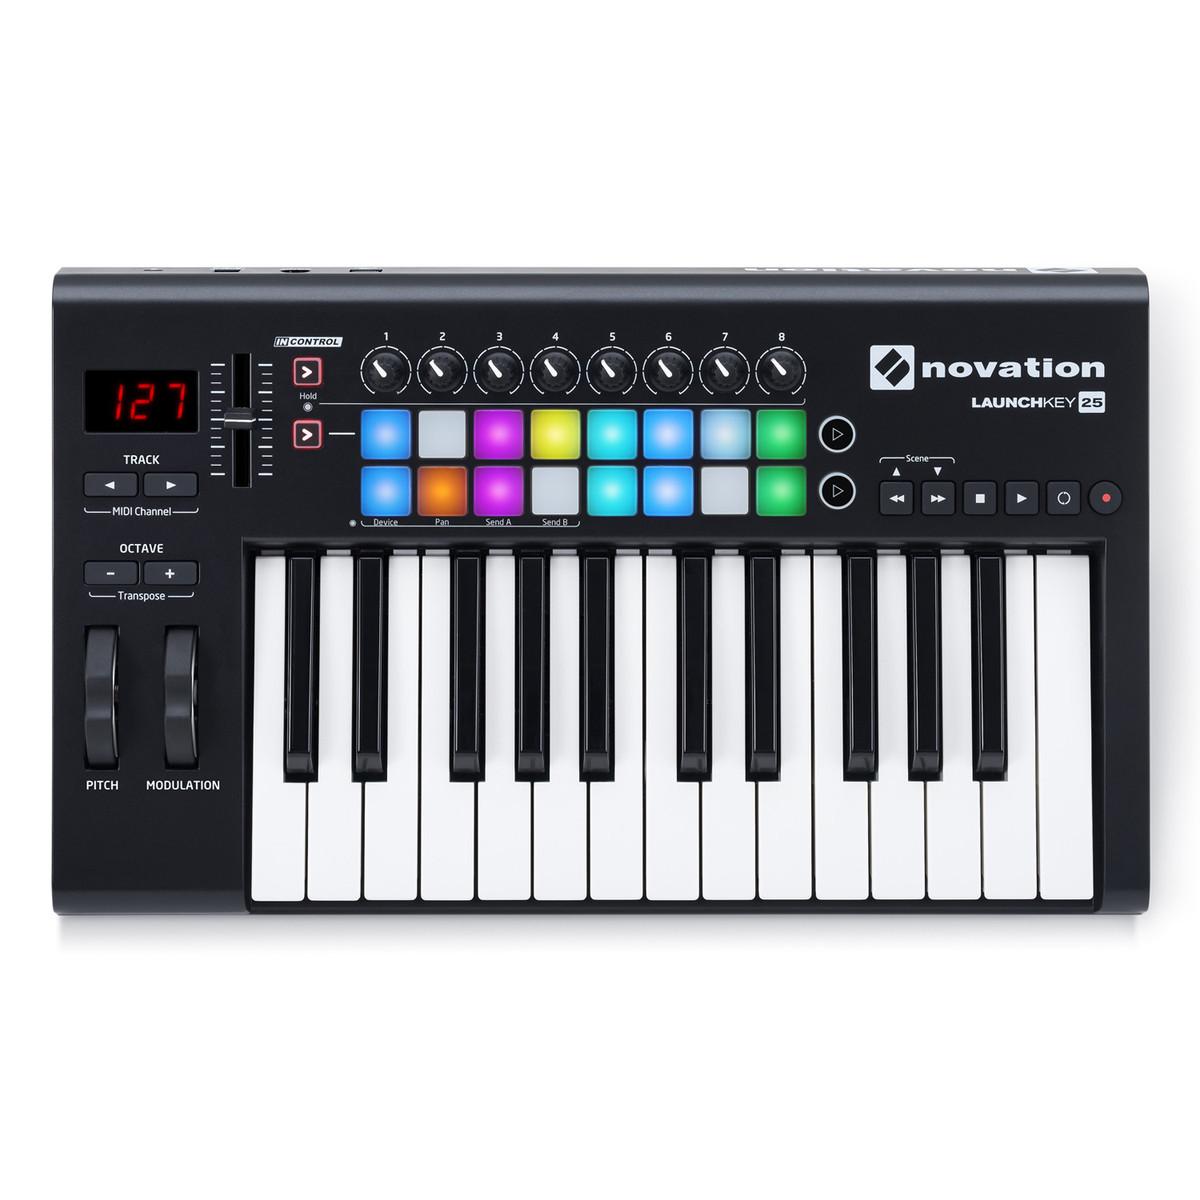 novation launchkey 25 mk2 midi controller keyboard at gear4music. Black Bedroom Furniture Sets. Home Design Ideas